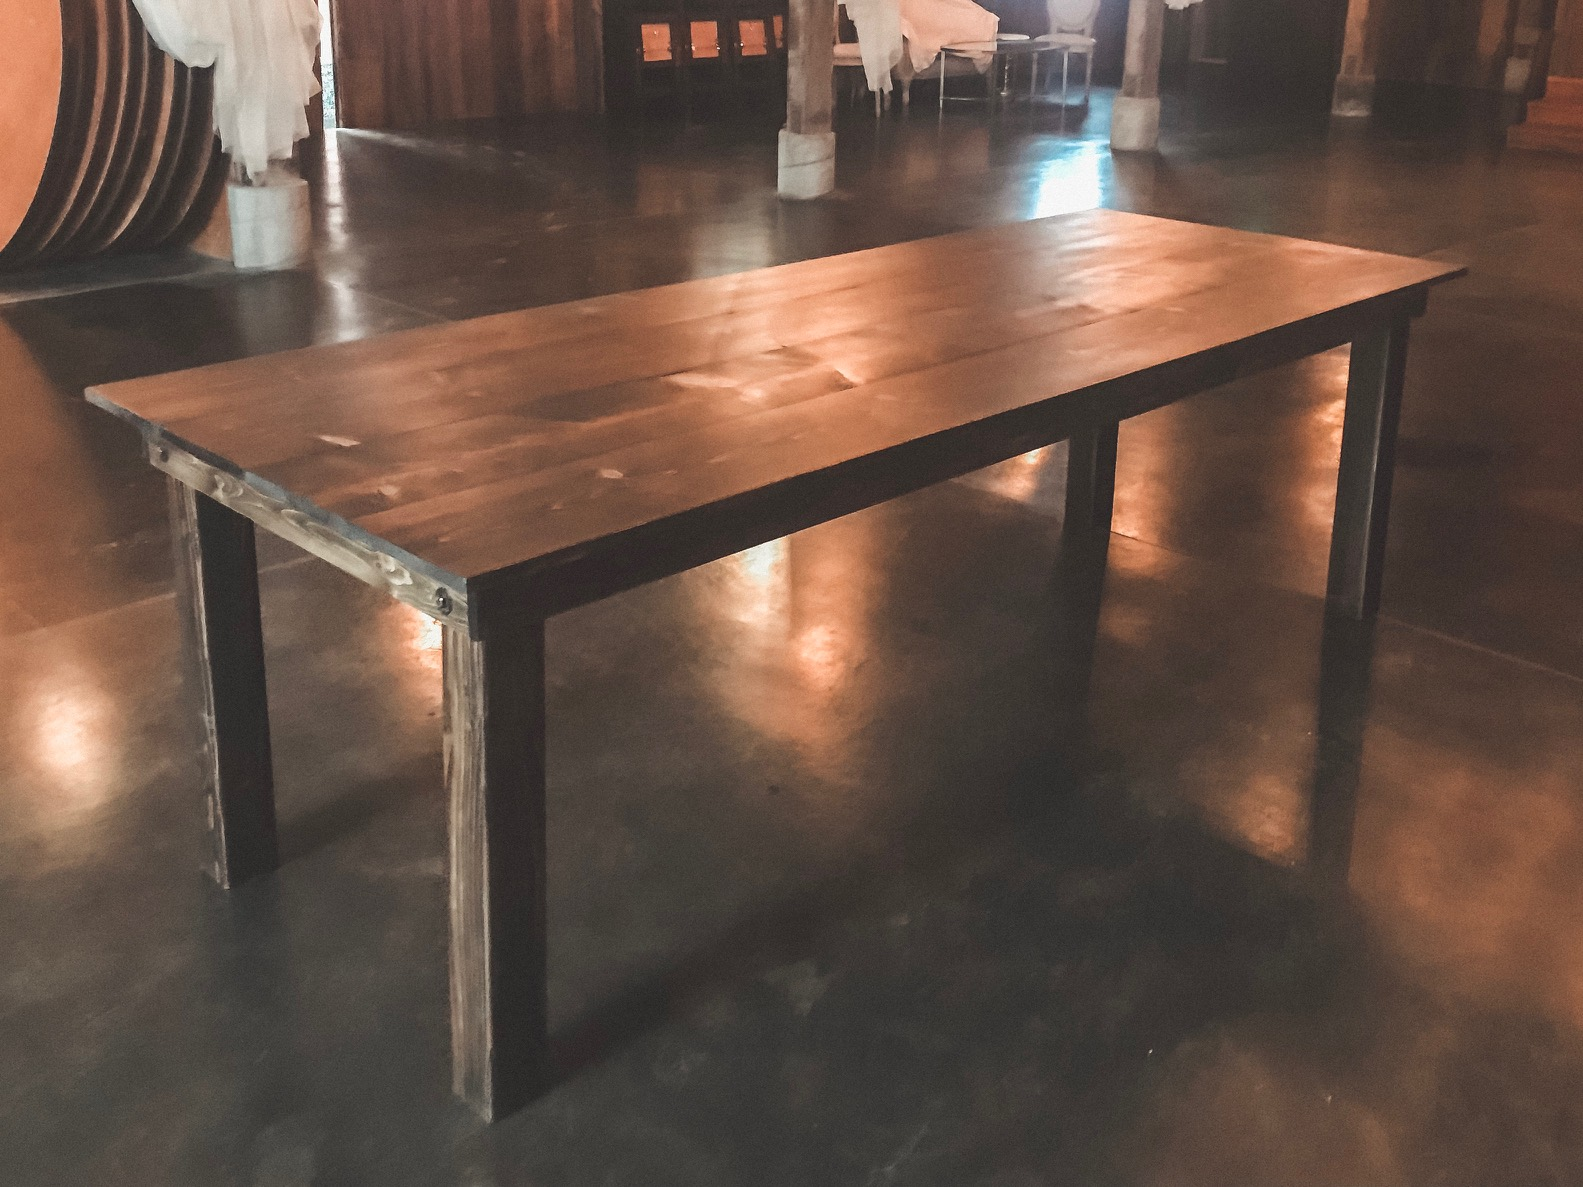 Classic Farm table $100 each (qty 3)